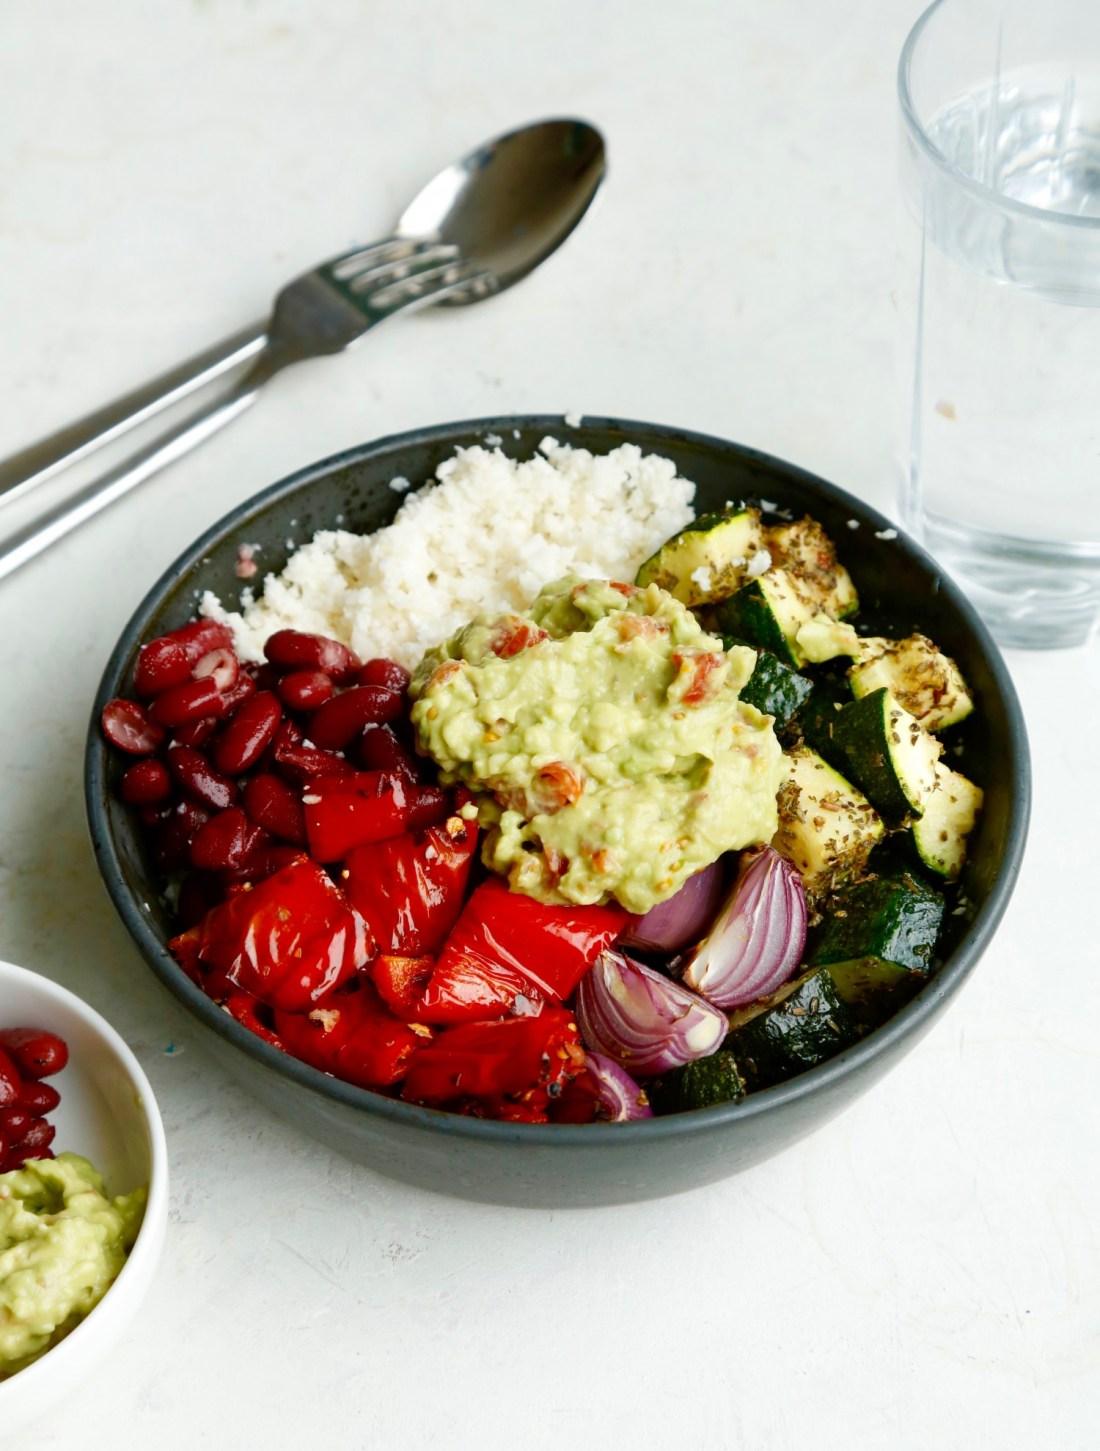 opskrift-burrito-bowl-salatskaal-med-mexicansk-tema-1-1